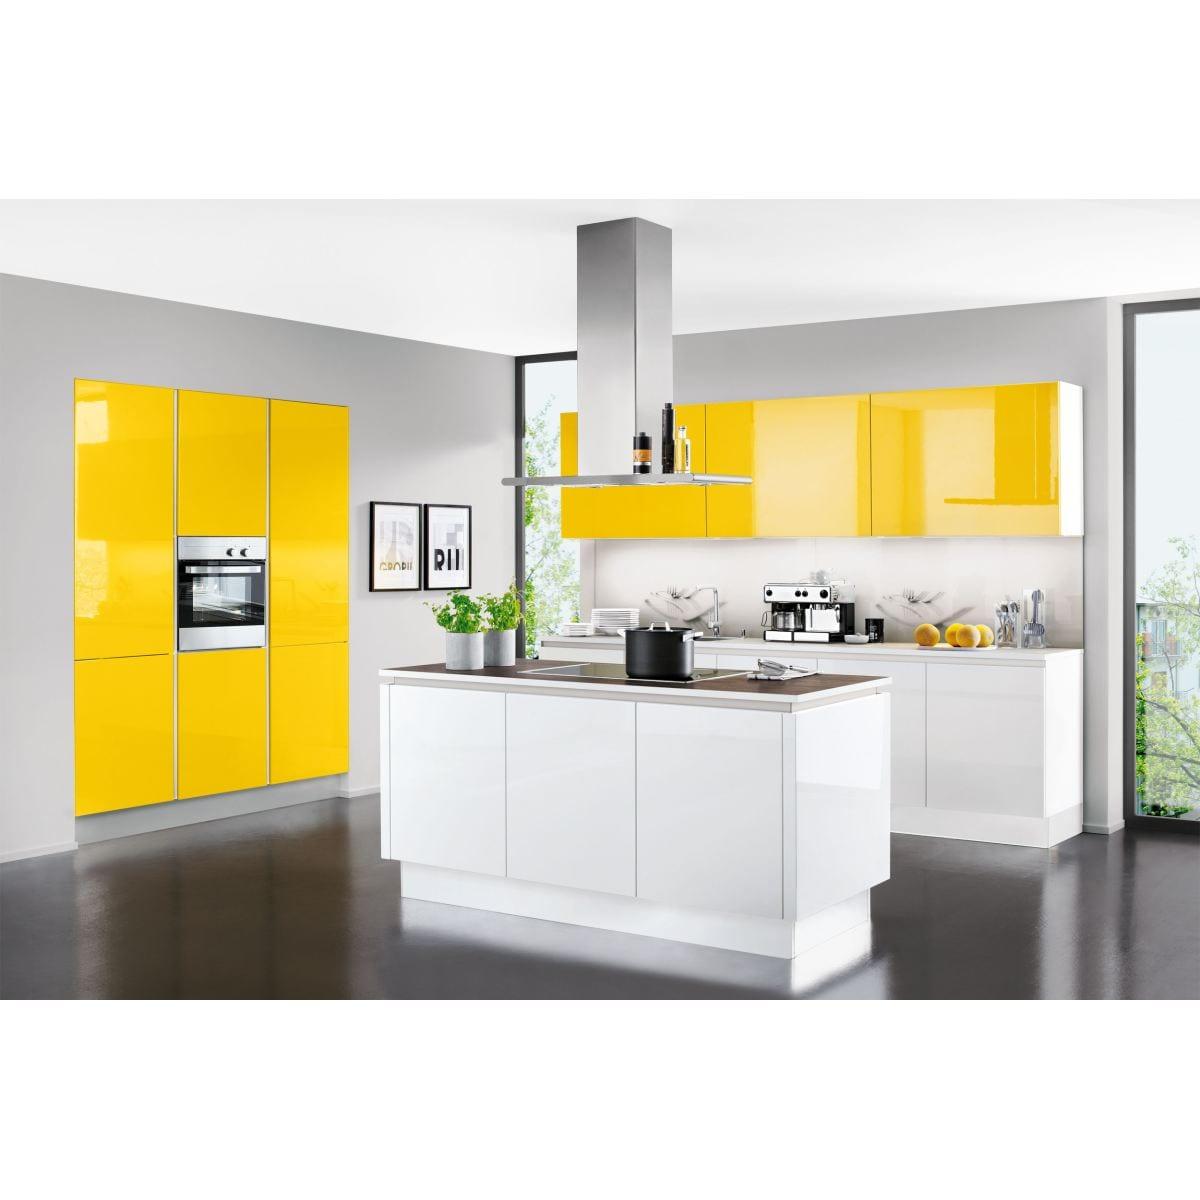 Lux insel kuche in hochglanz weiss oder lemon porta for Küche porta